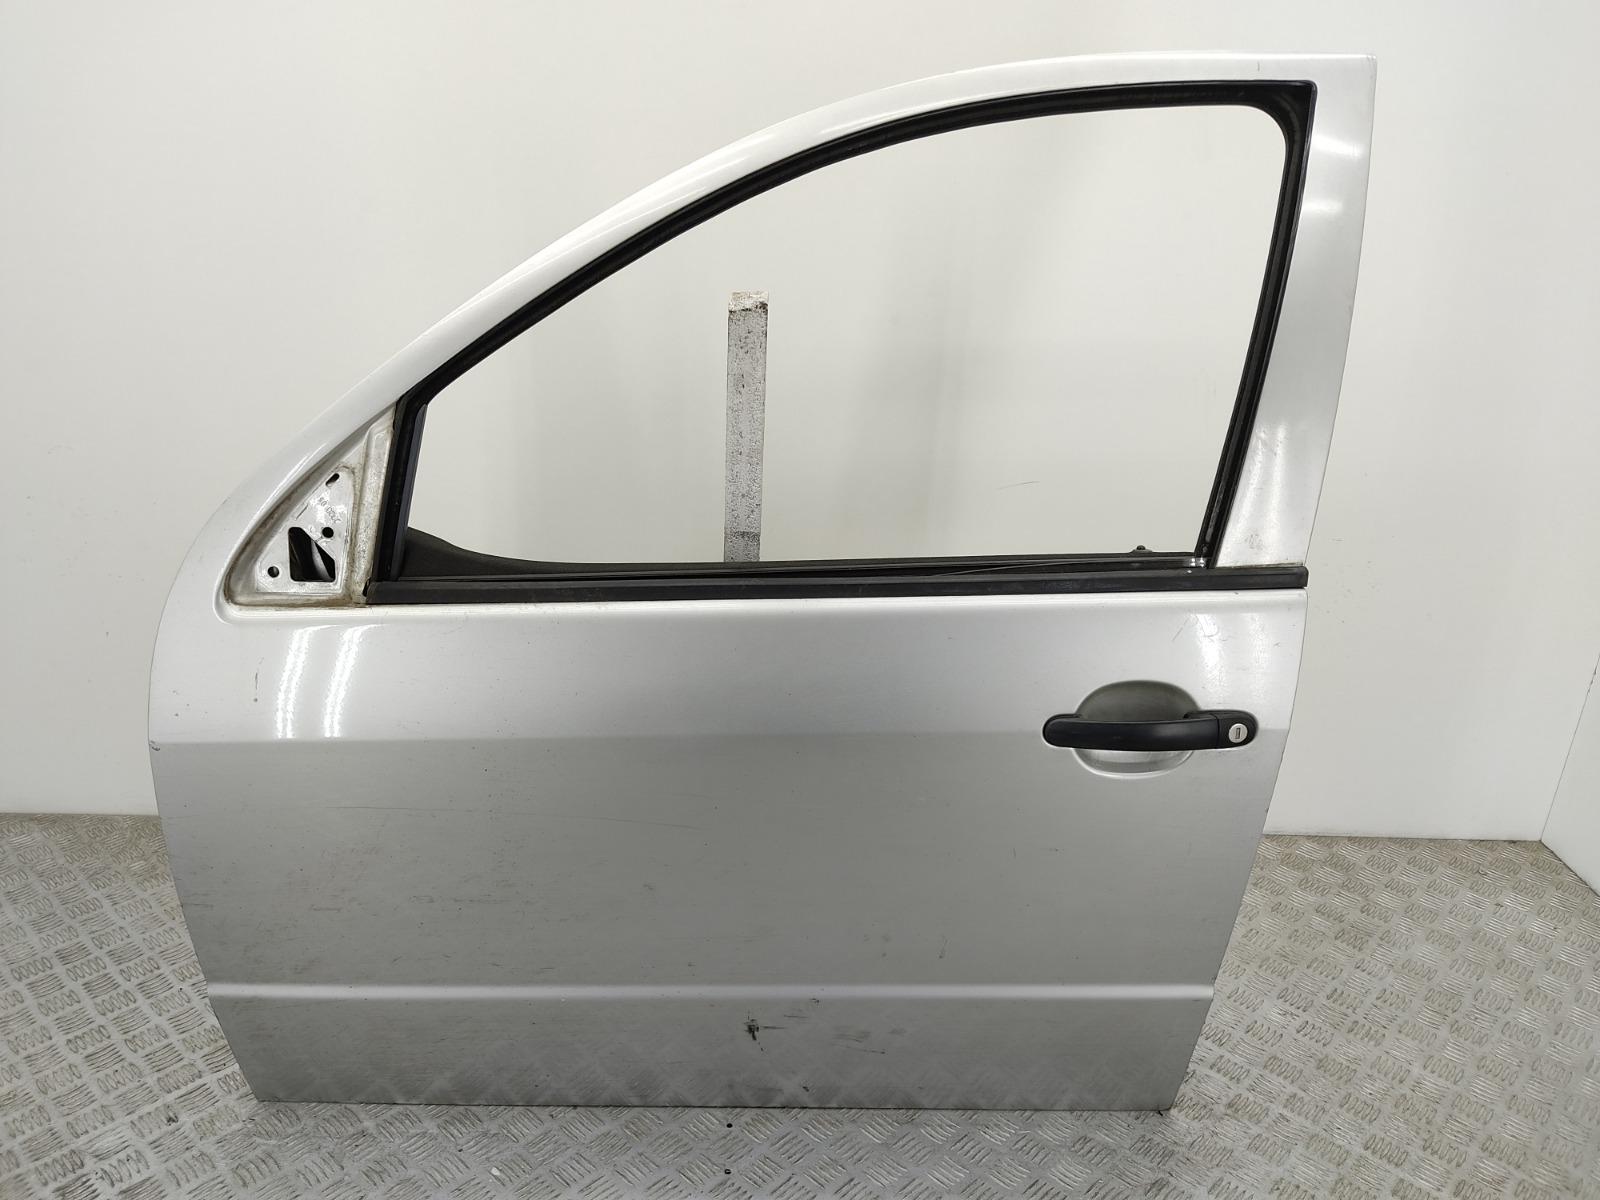 Дверь передняя левая Skoda Fabia 1 1.4 TDI 2005 (б/у)